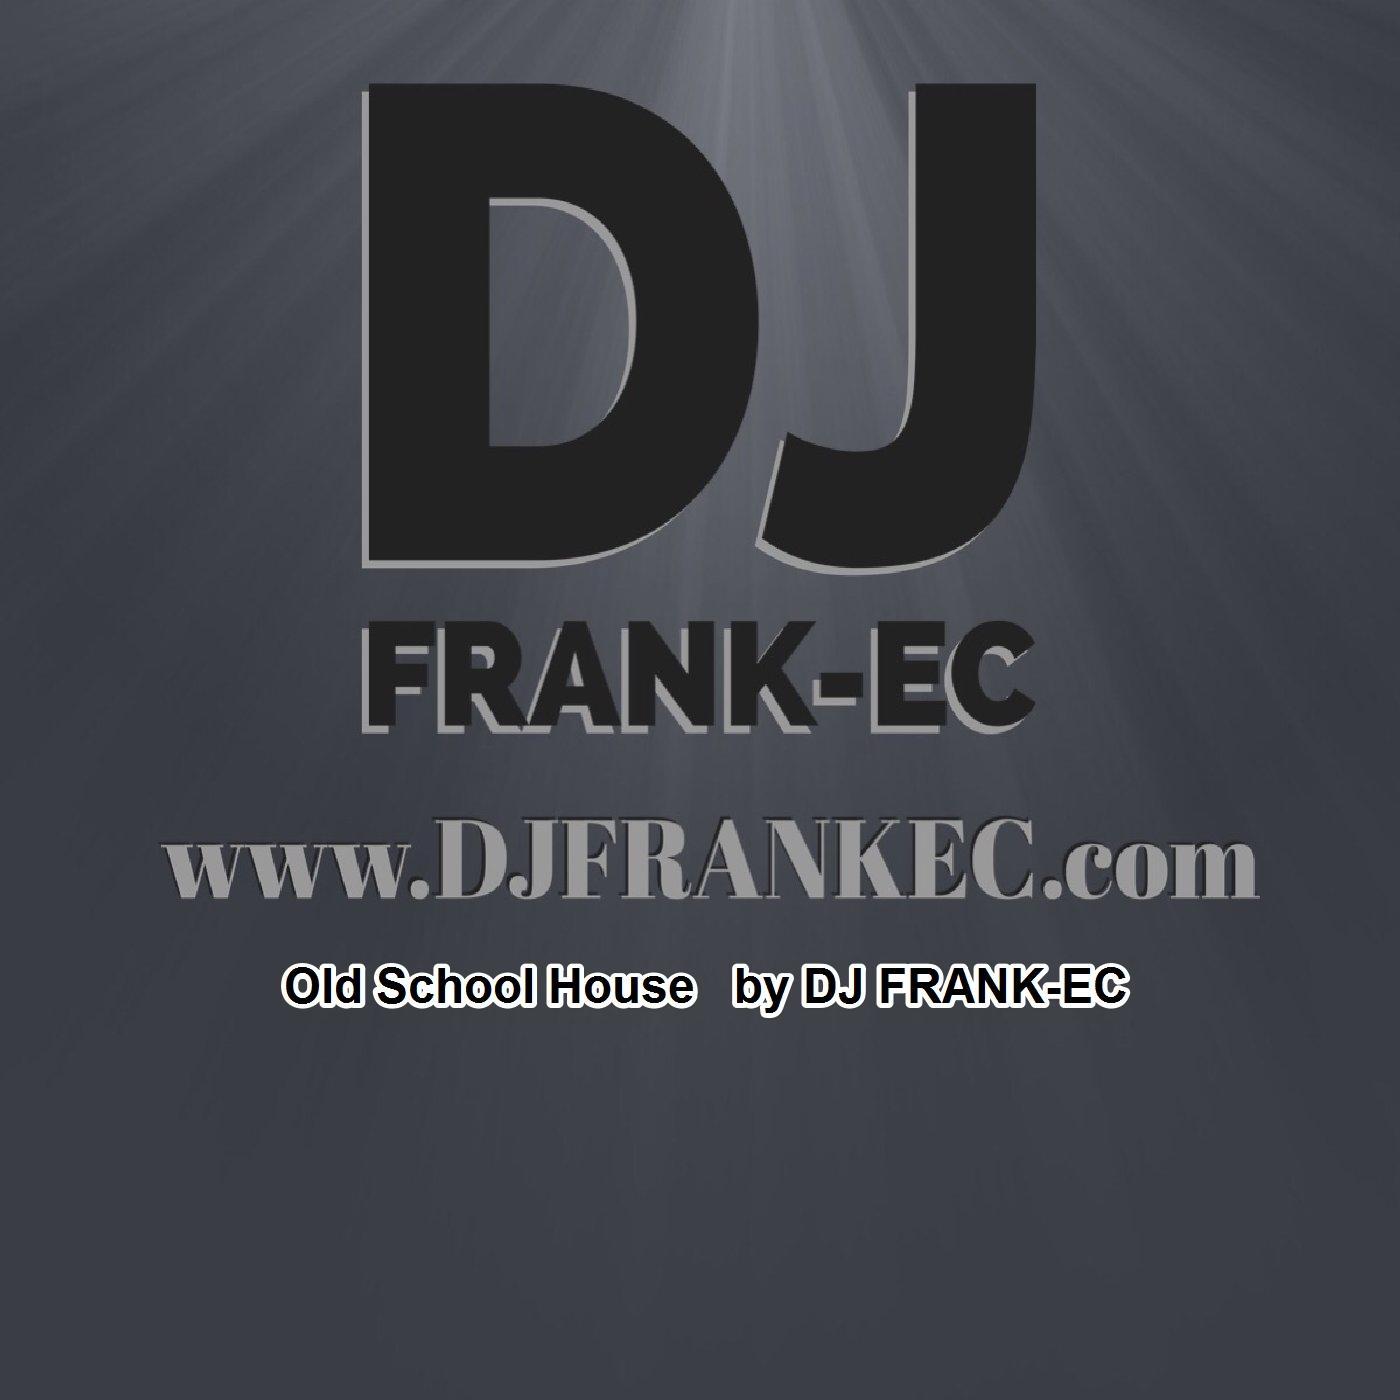 Old School House - DJ Frank-EC